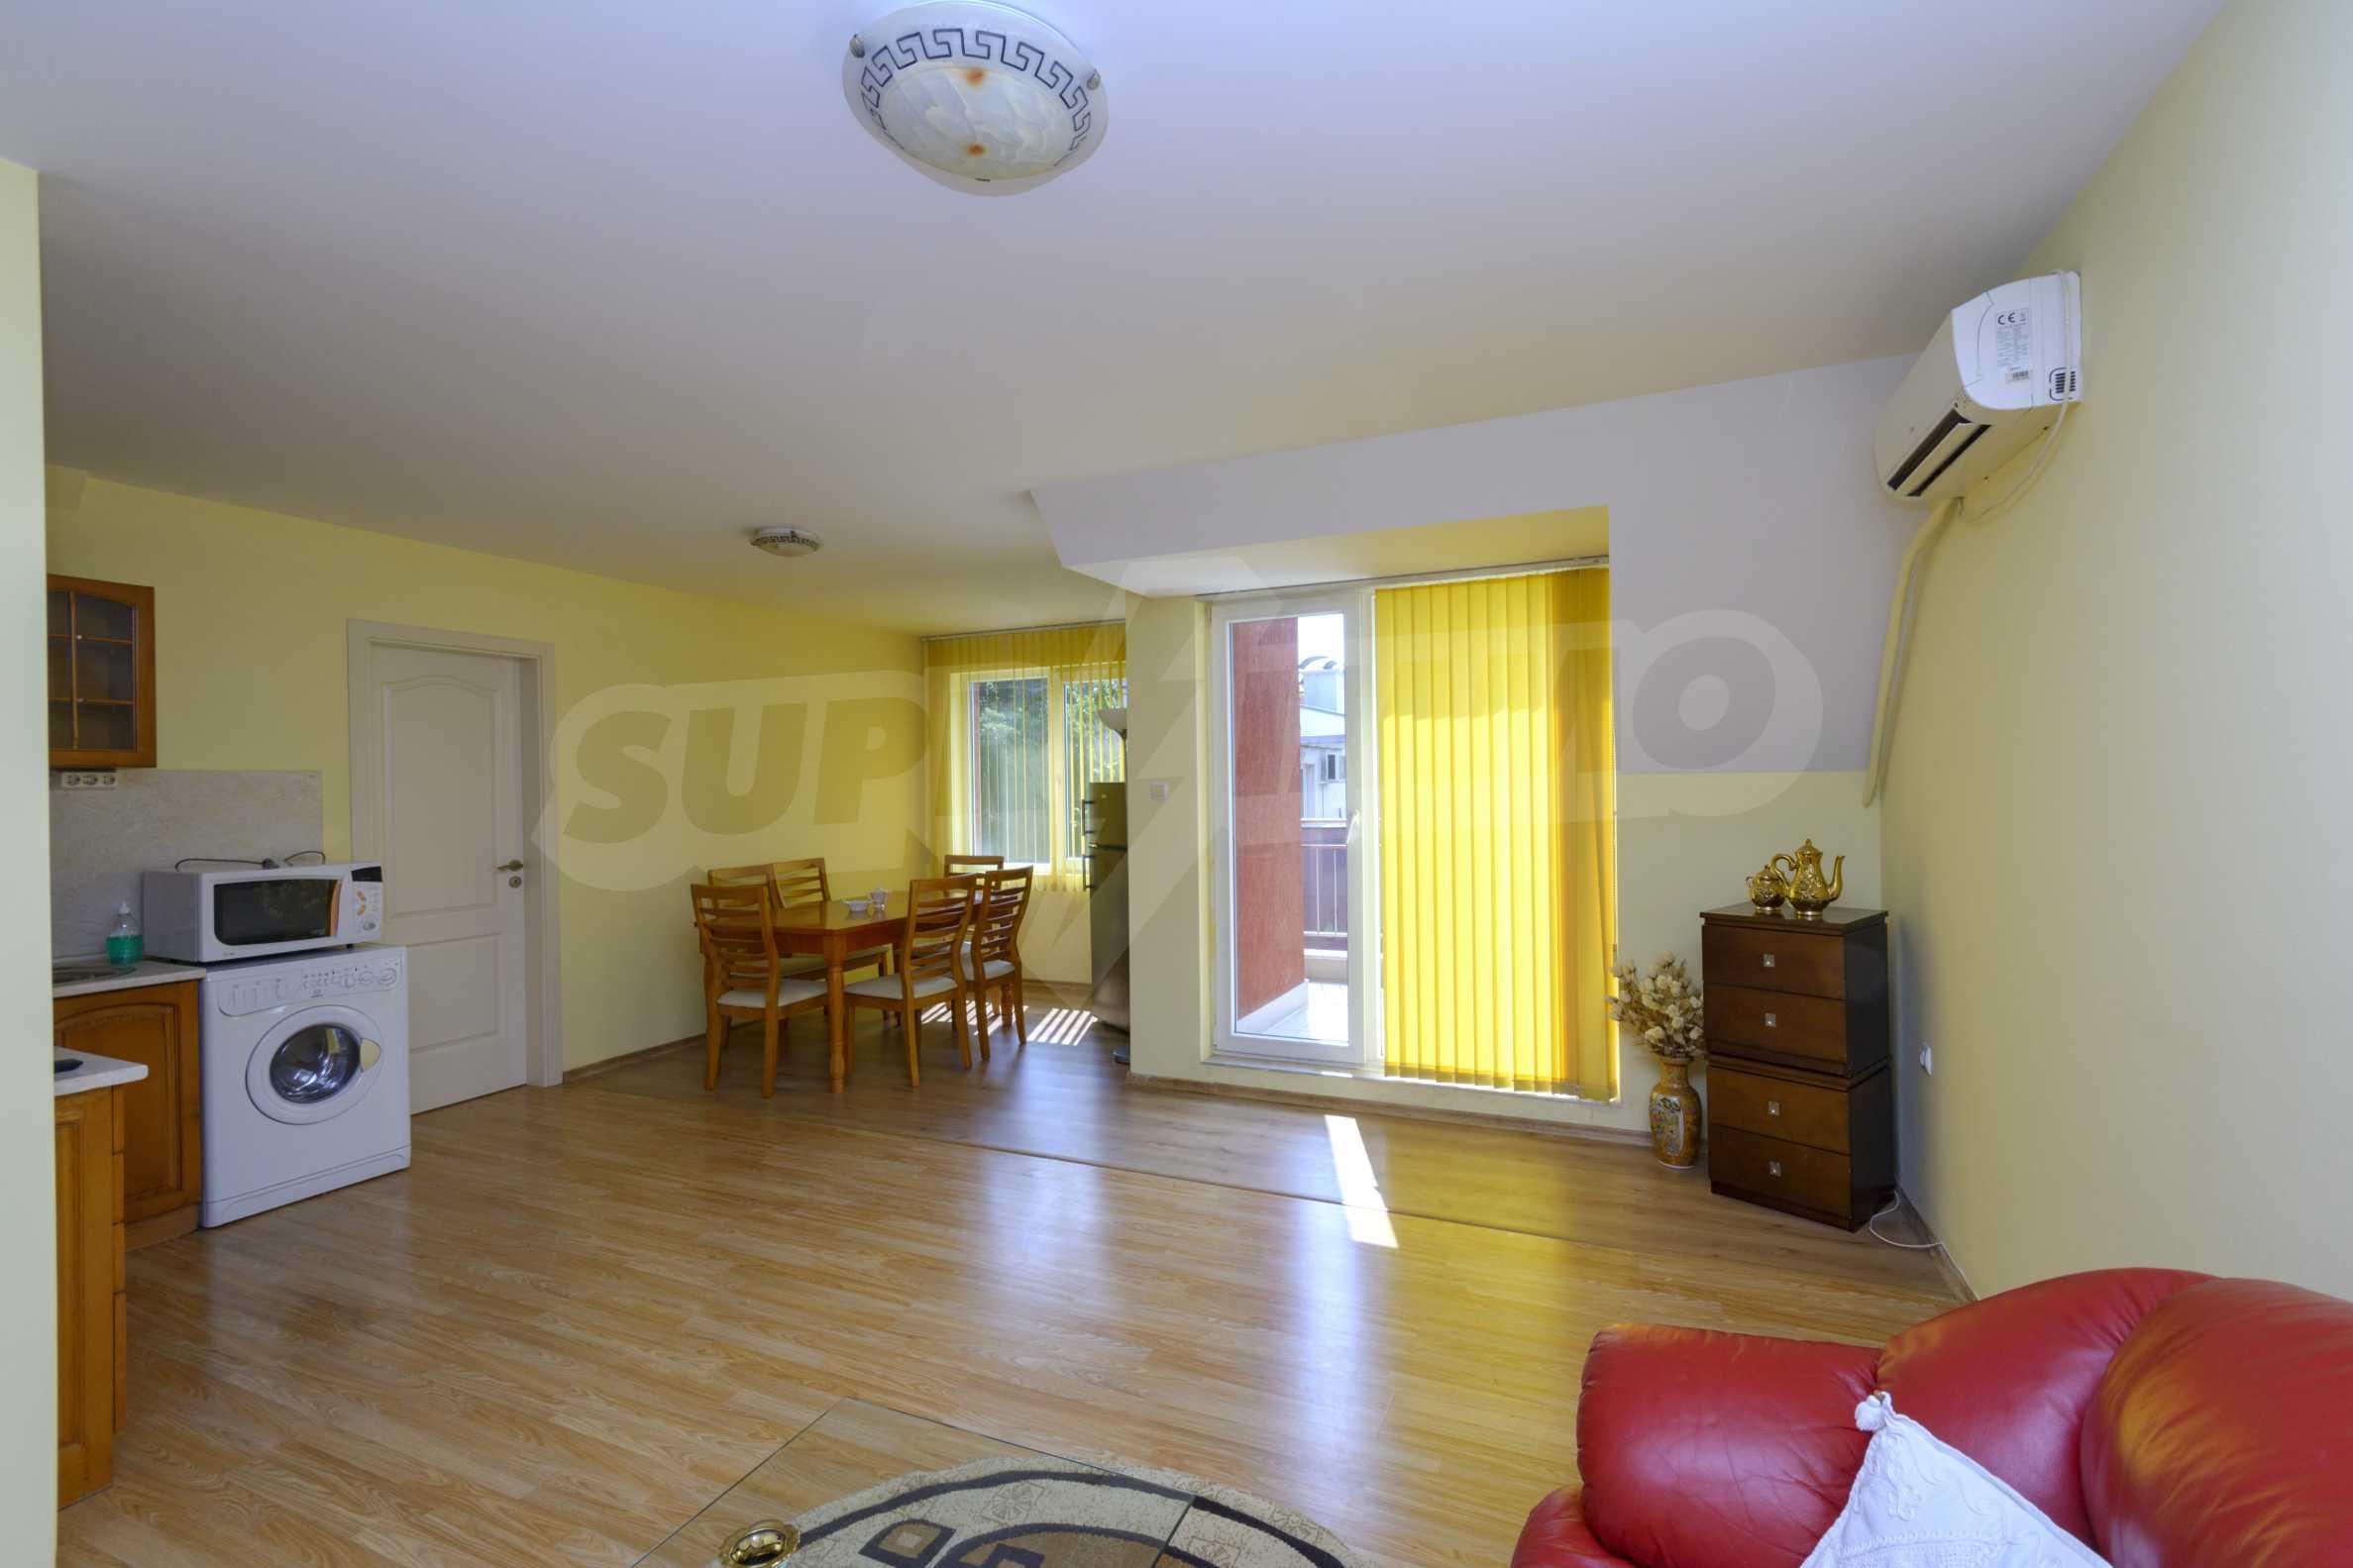 Многостаен апартамент до Гранд Хотел Пловдив 10